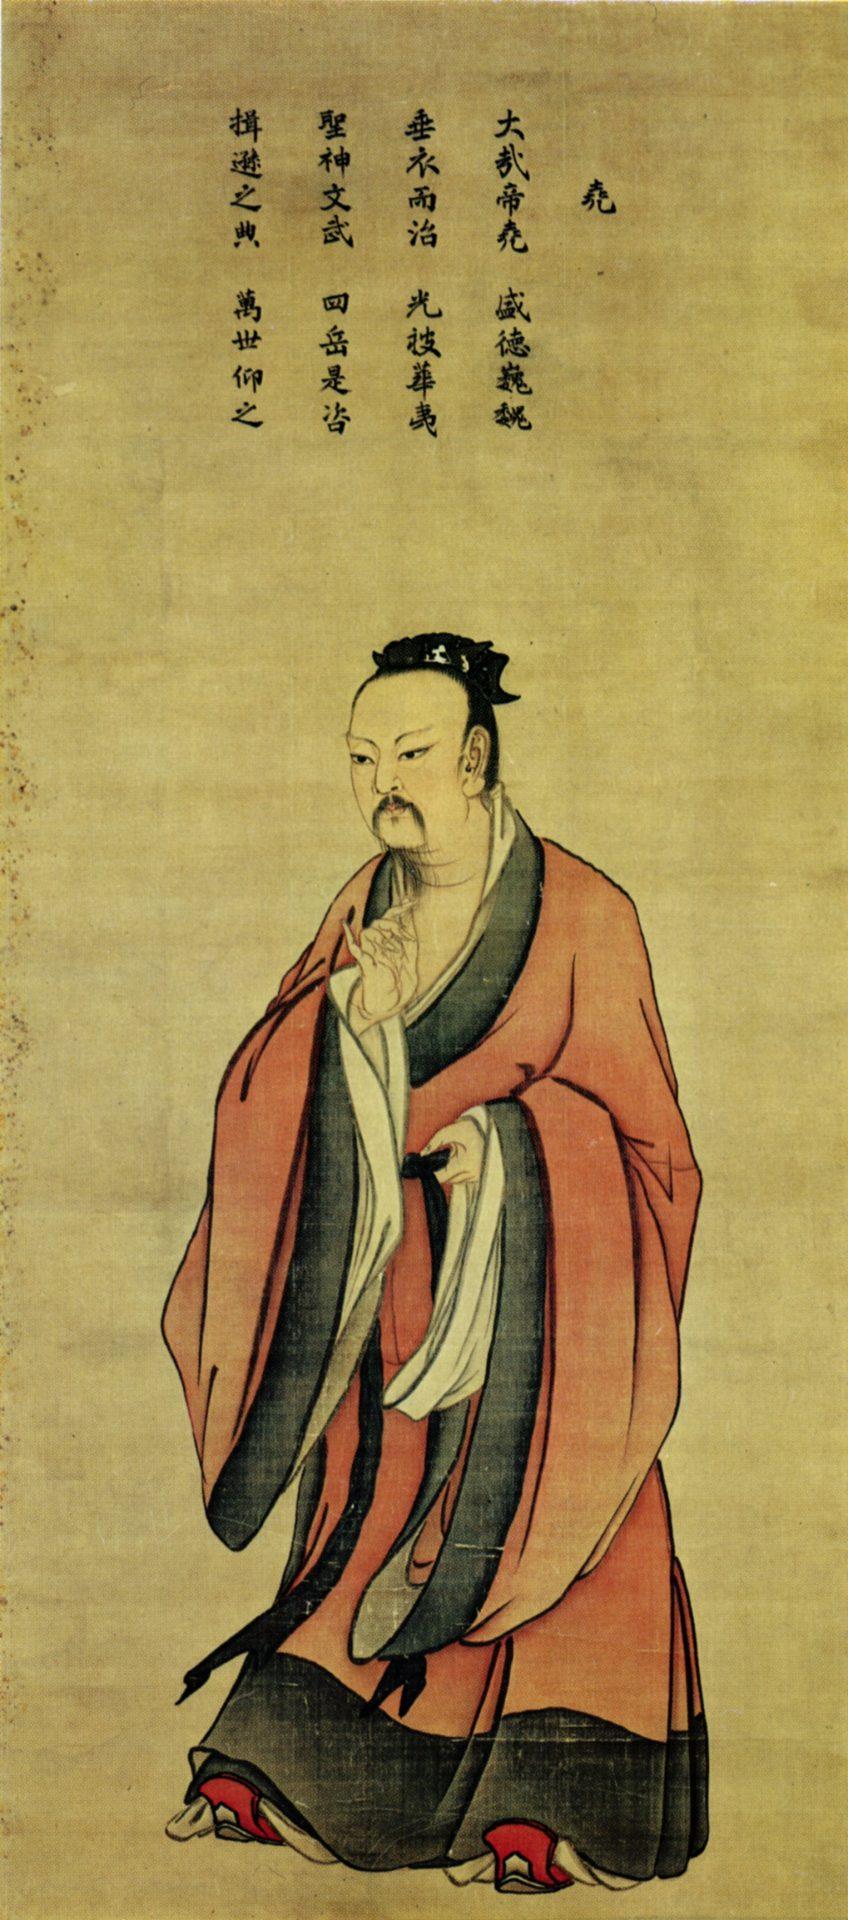 Emperor Yao (Image: wikimedia / CC0 1.0)